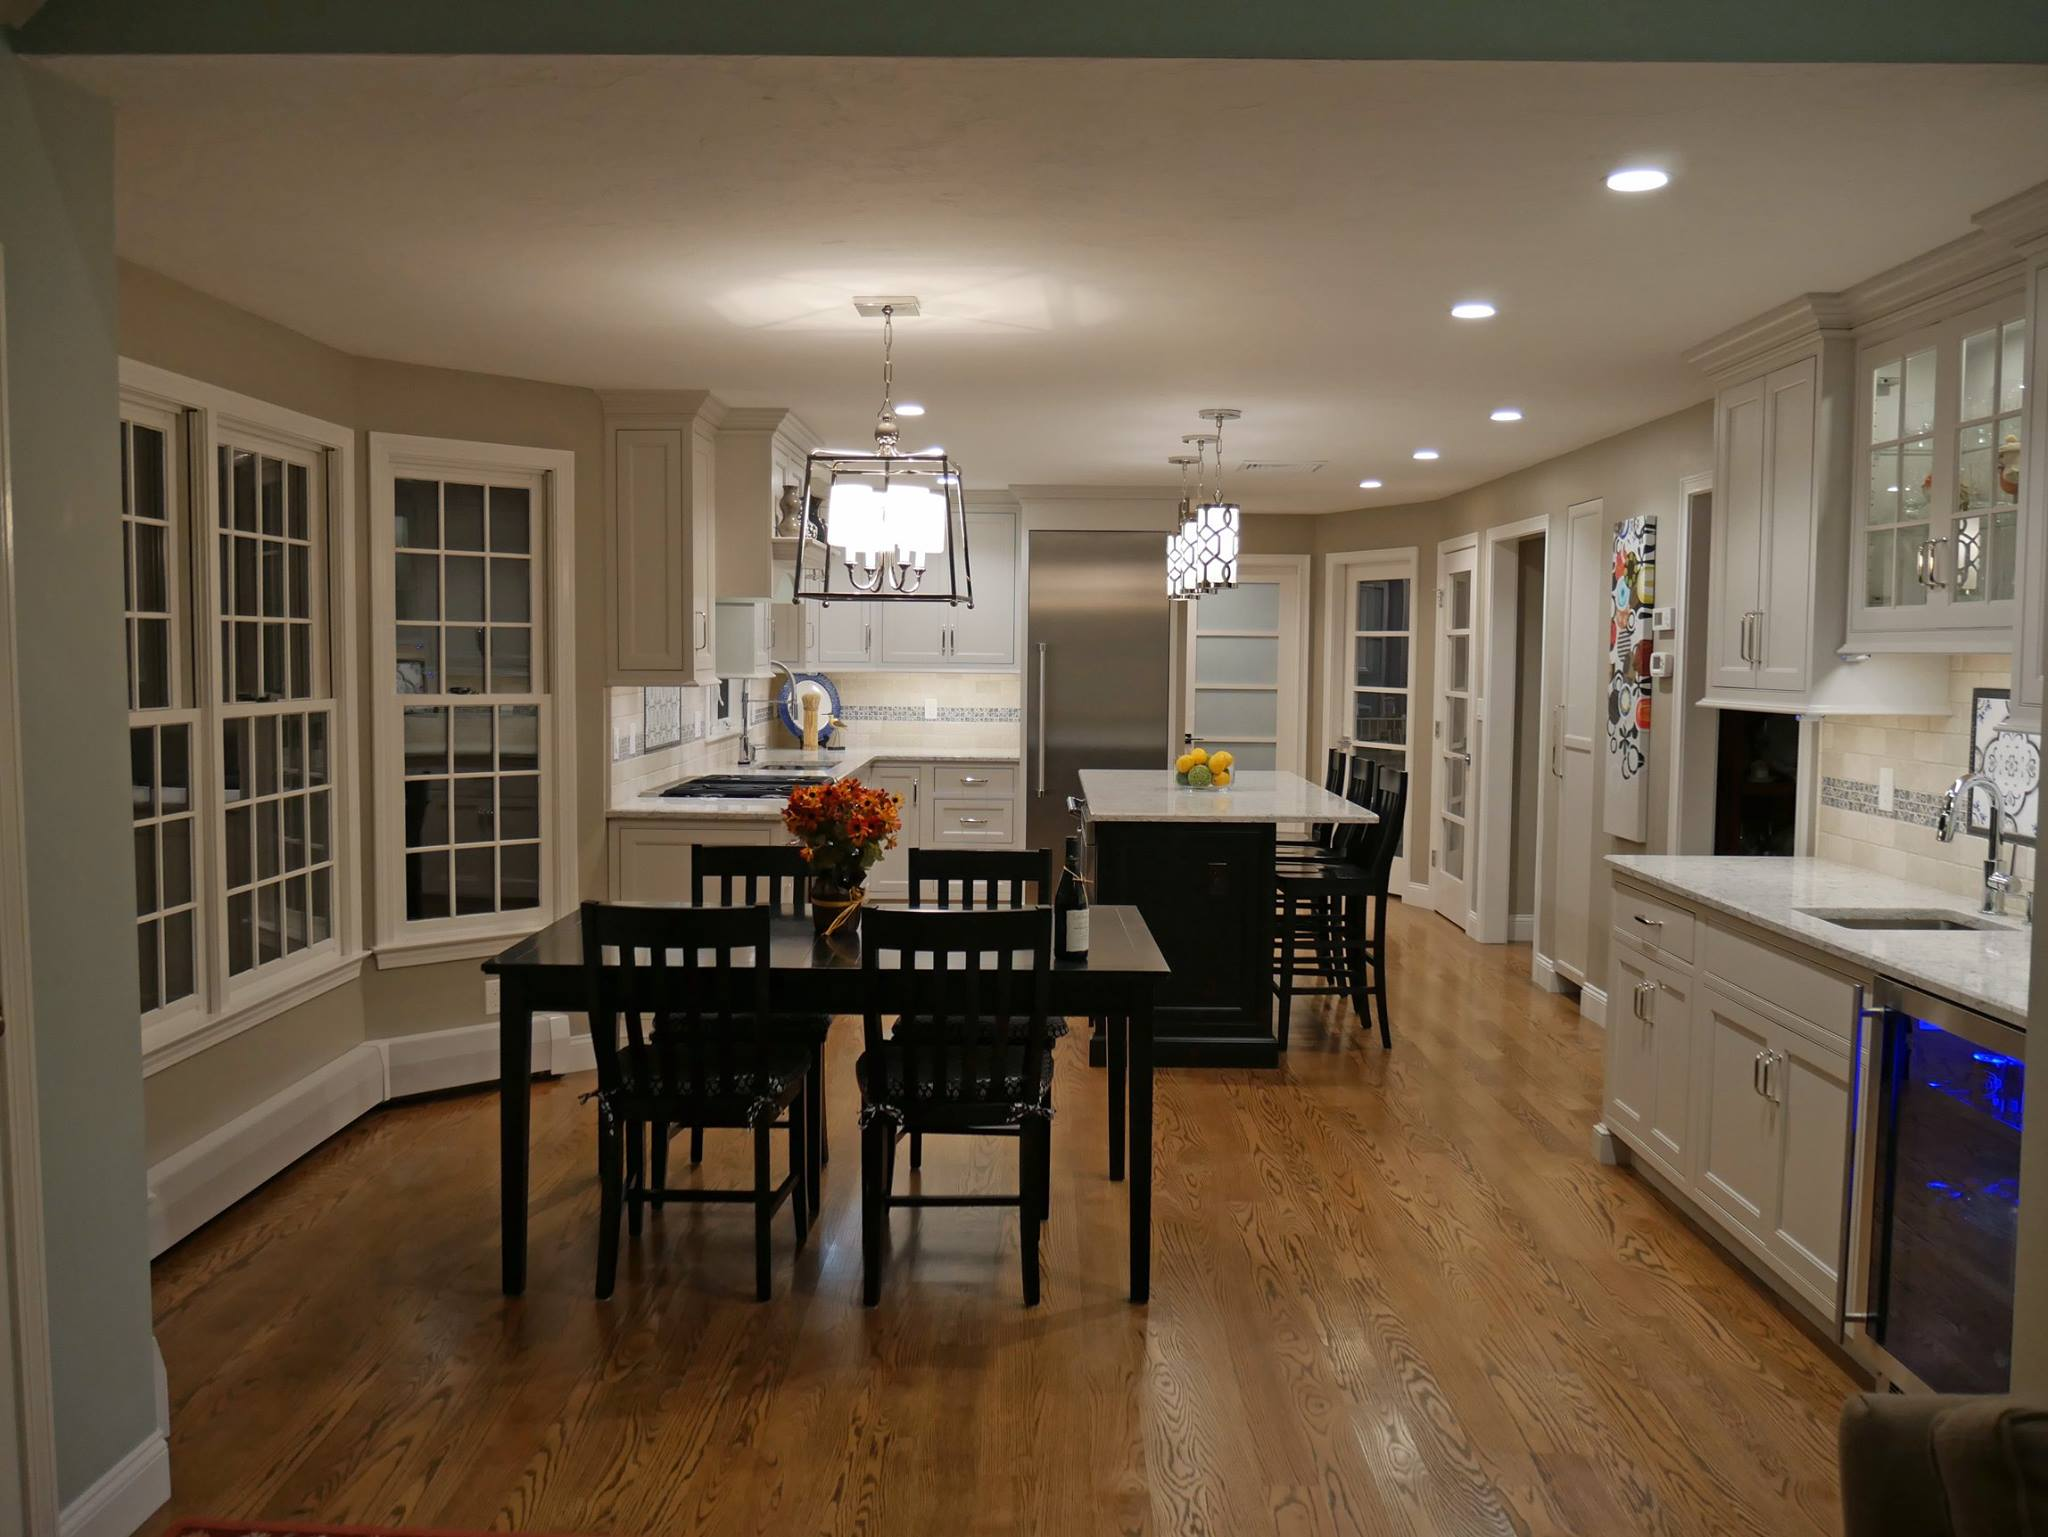 Custom Light Fixtures & Interior Design